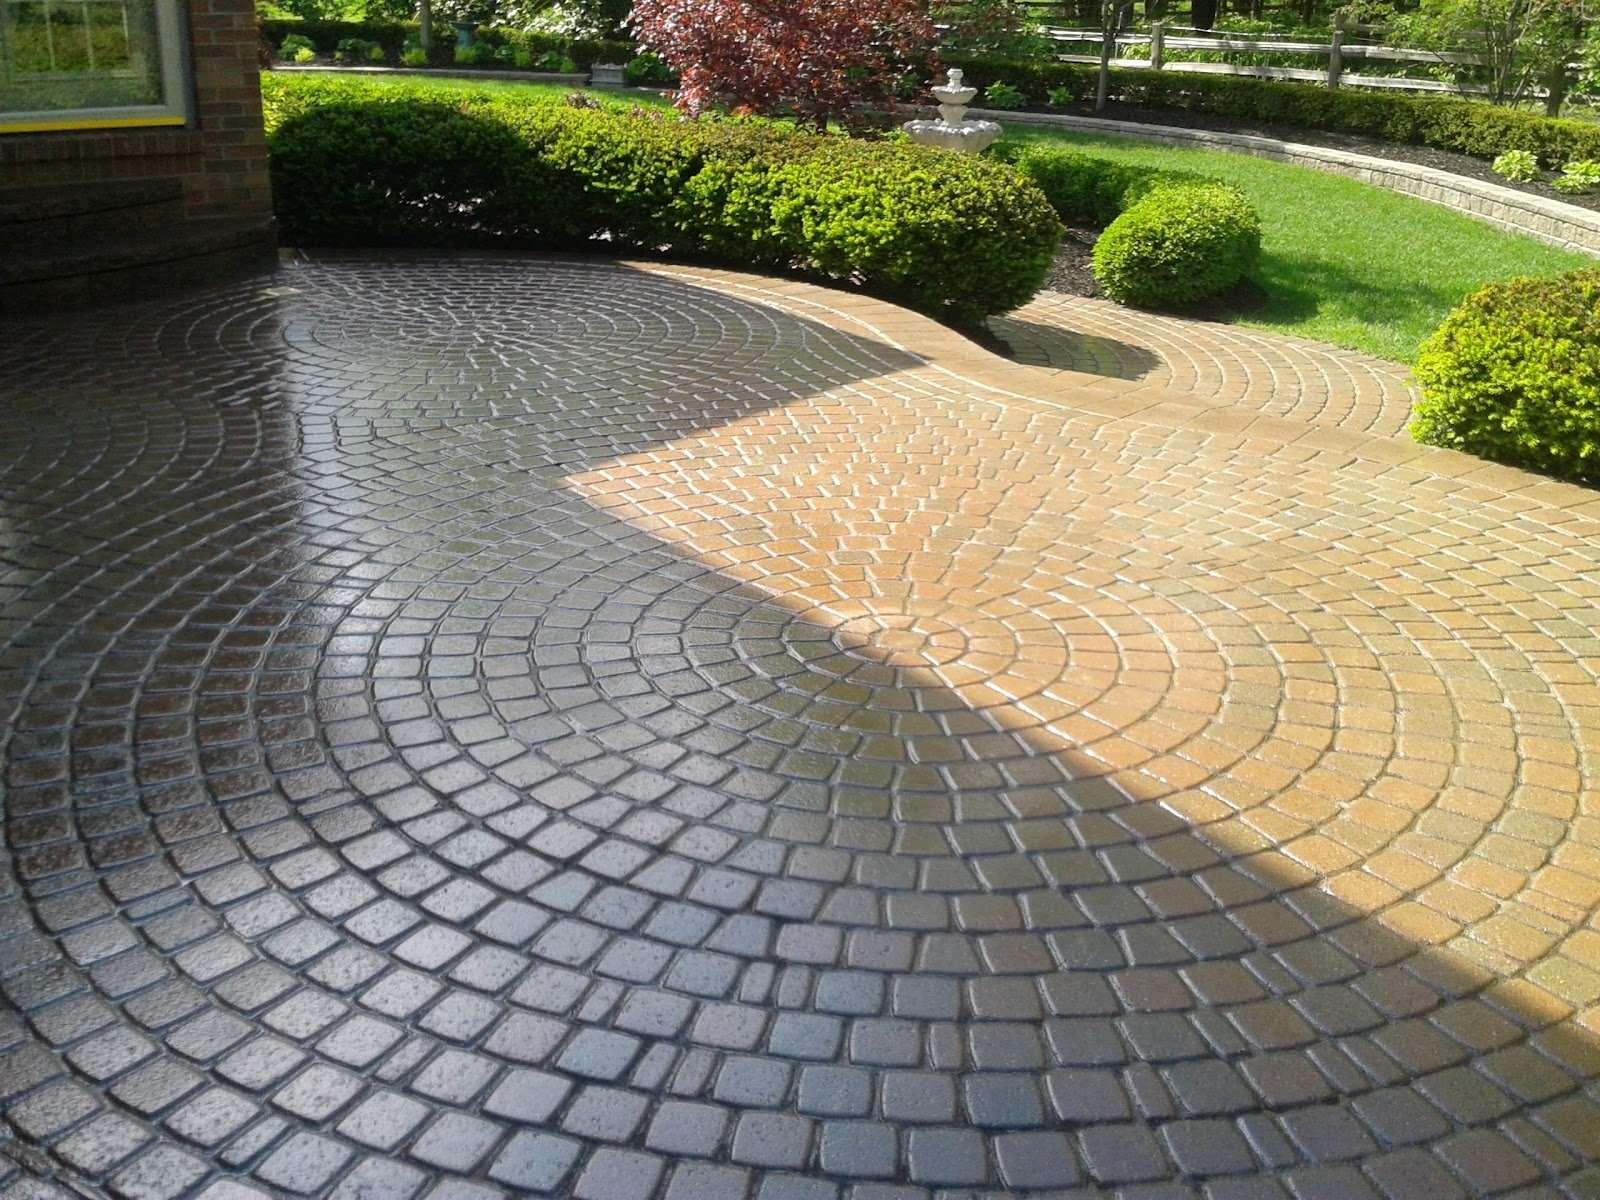 Brick Paver Patio Design, Installation, and Maintenance ...